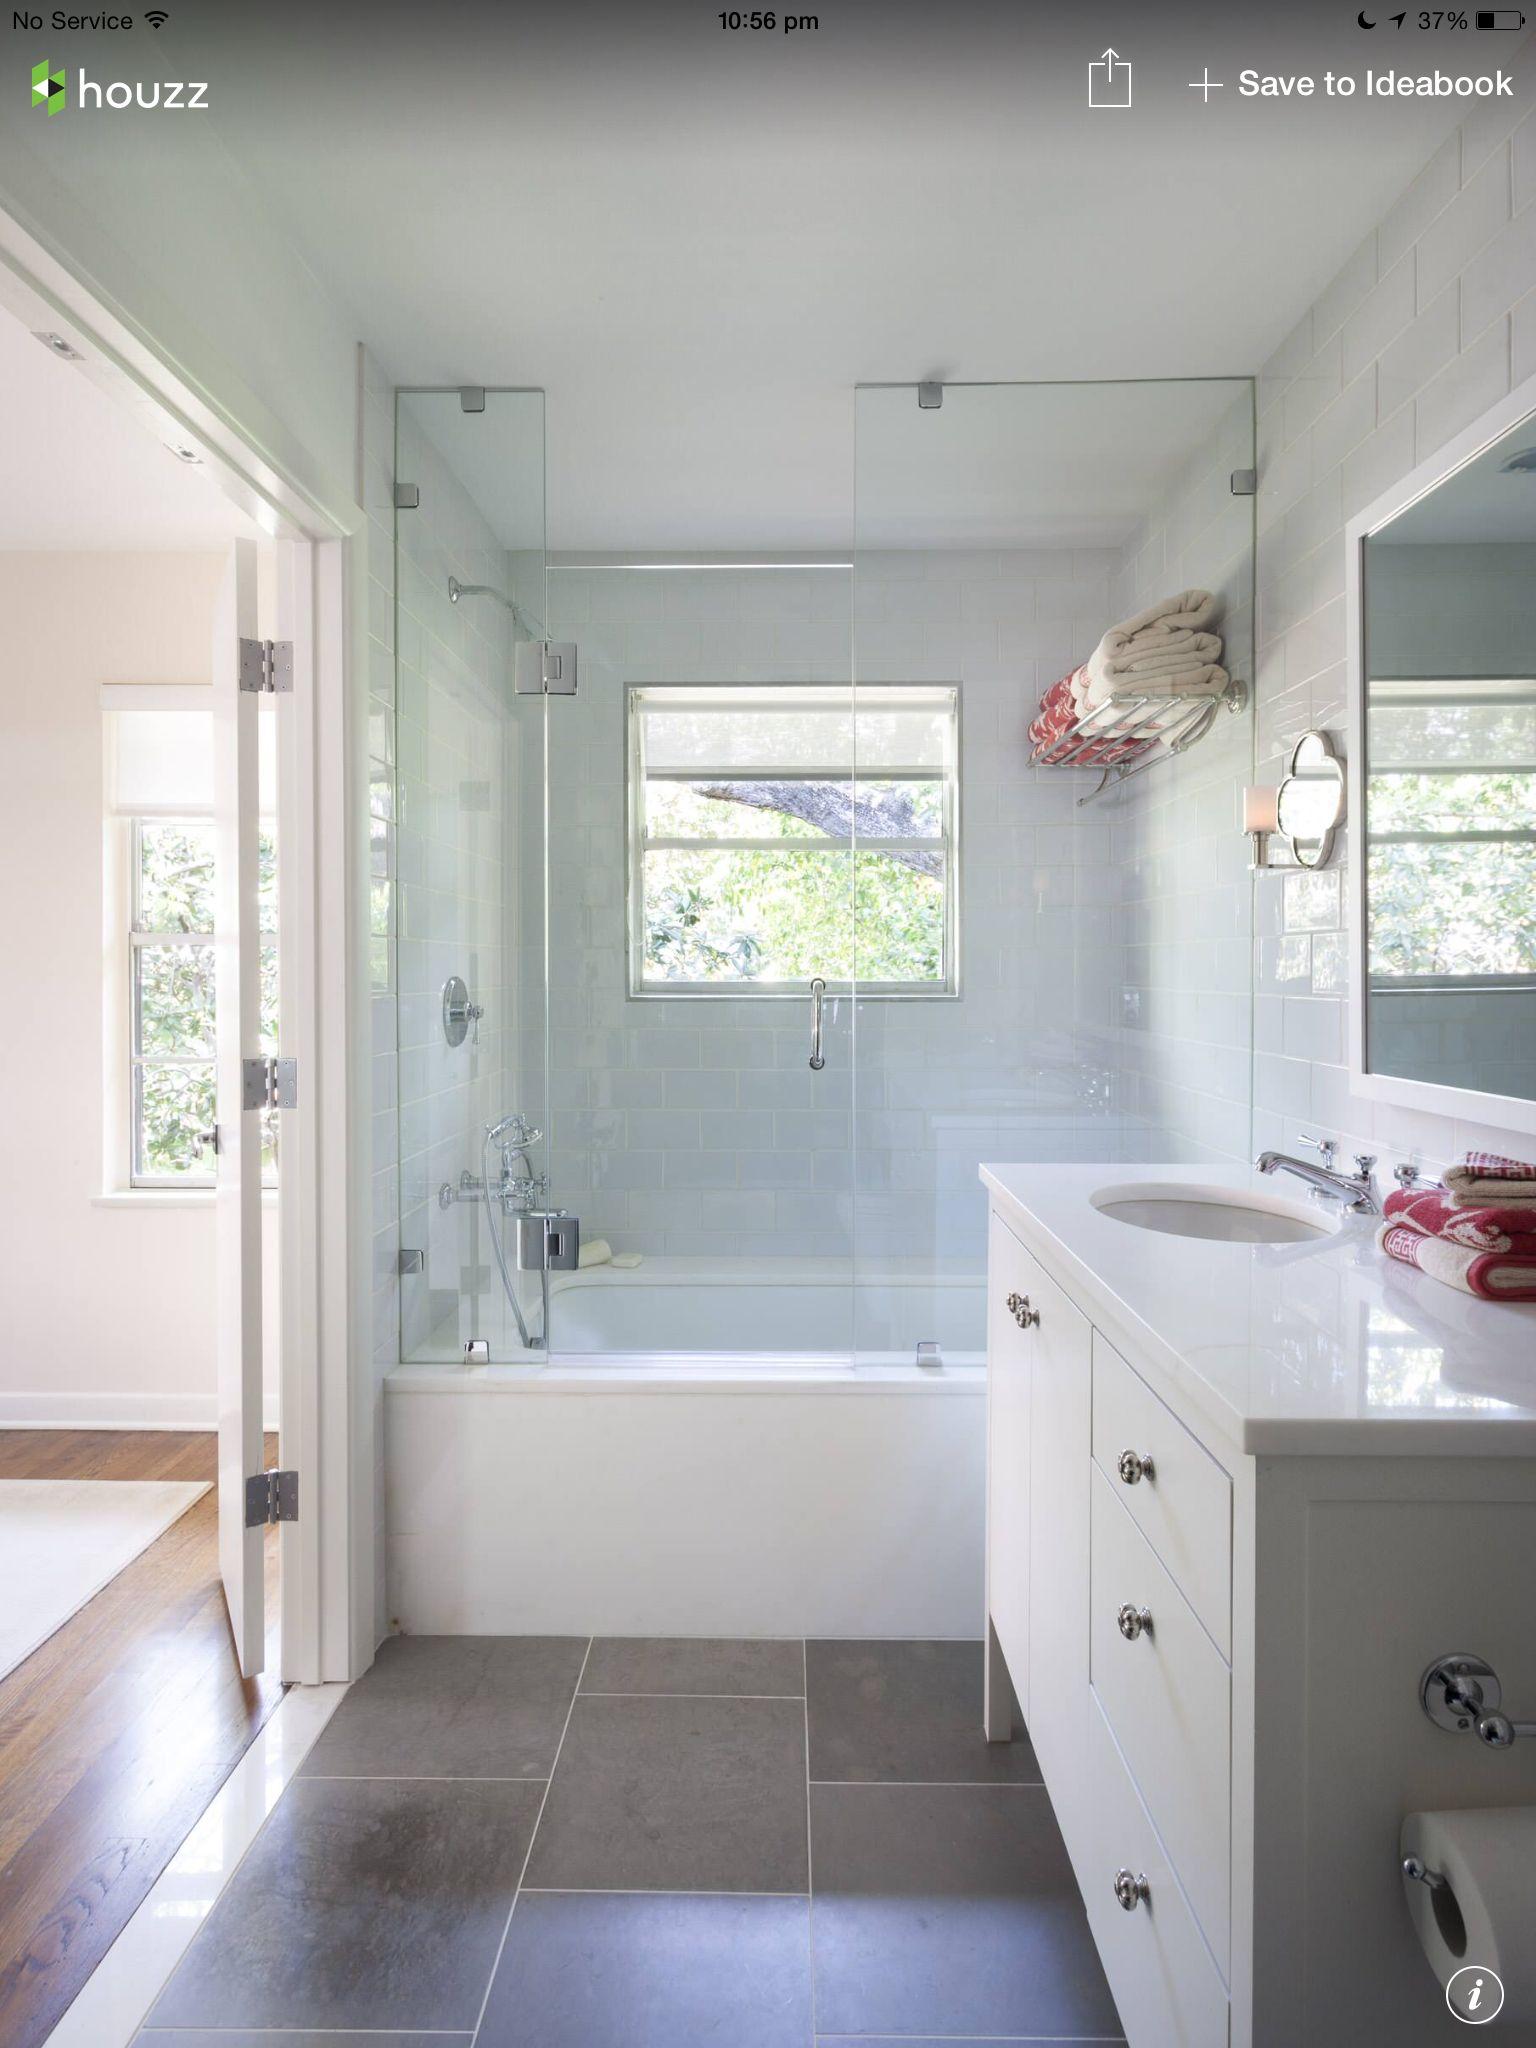 Large Mid Grey Floor Tiles With Soft Grey Subway Wall Tiles Houzz Bathroom Tub Shower Combo Bathtub Shower Combo Bathroom Tub Shower